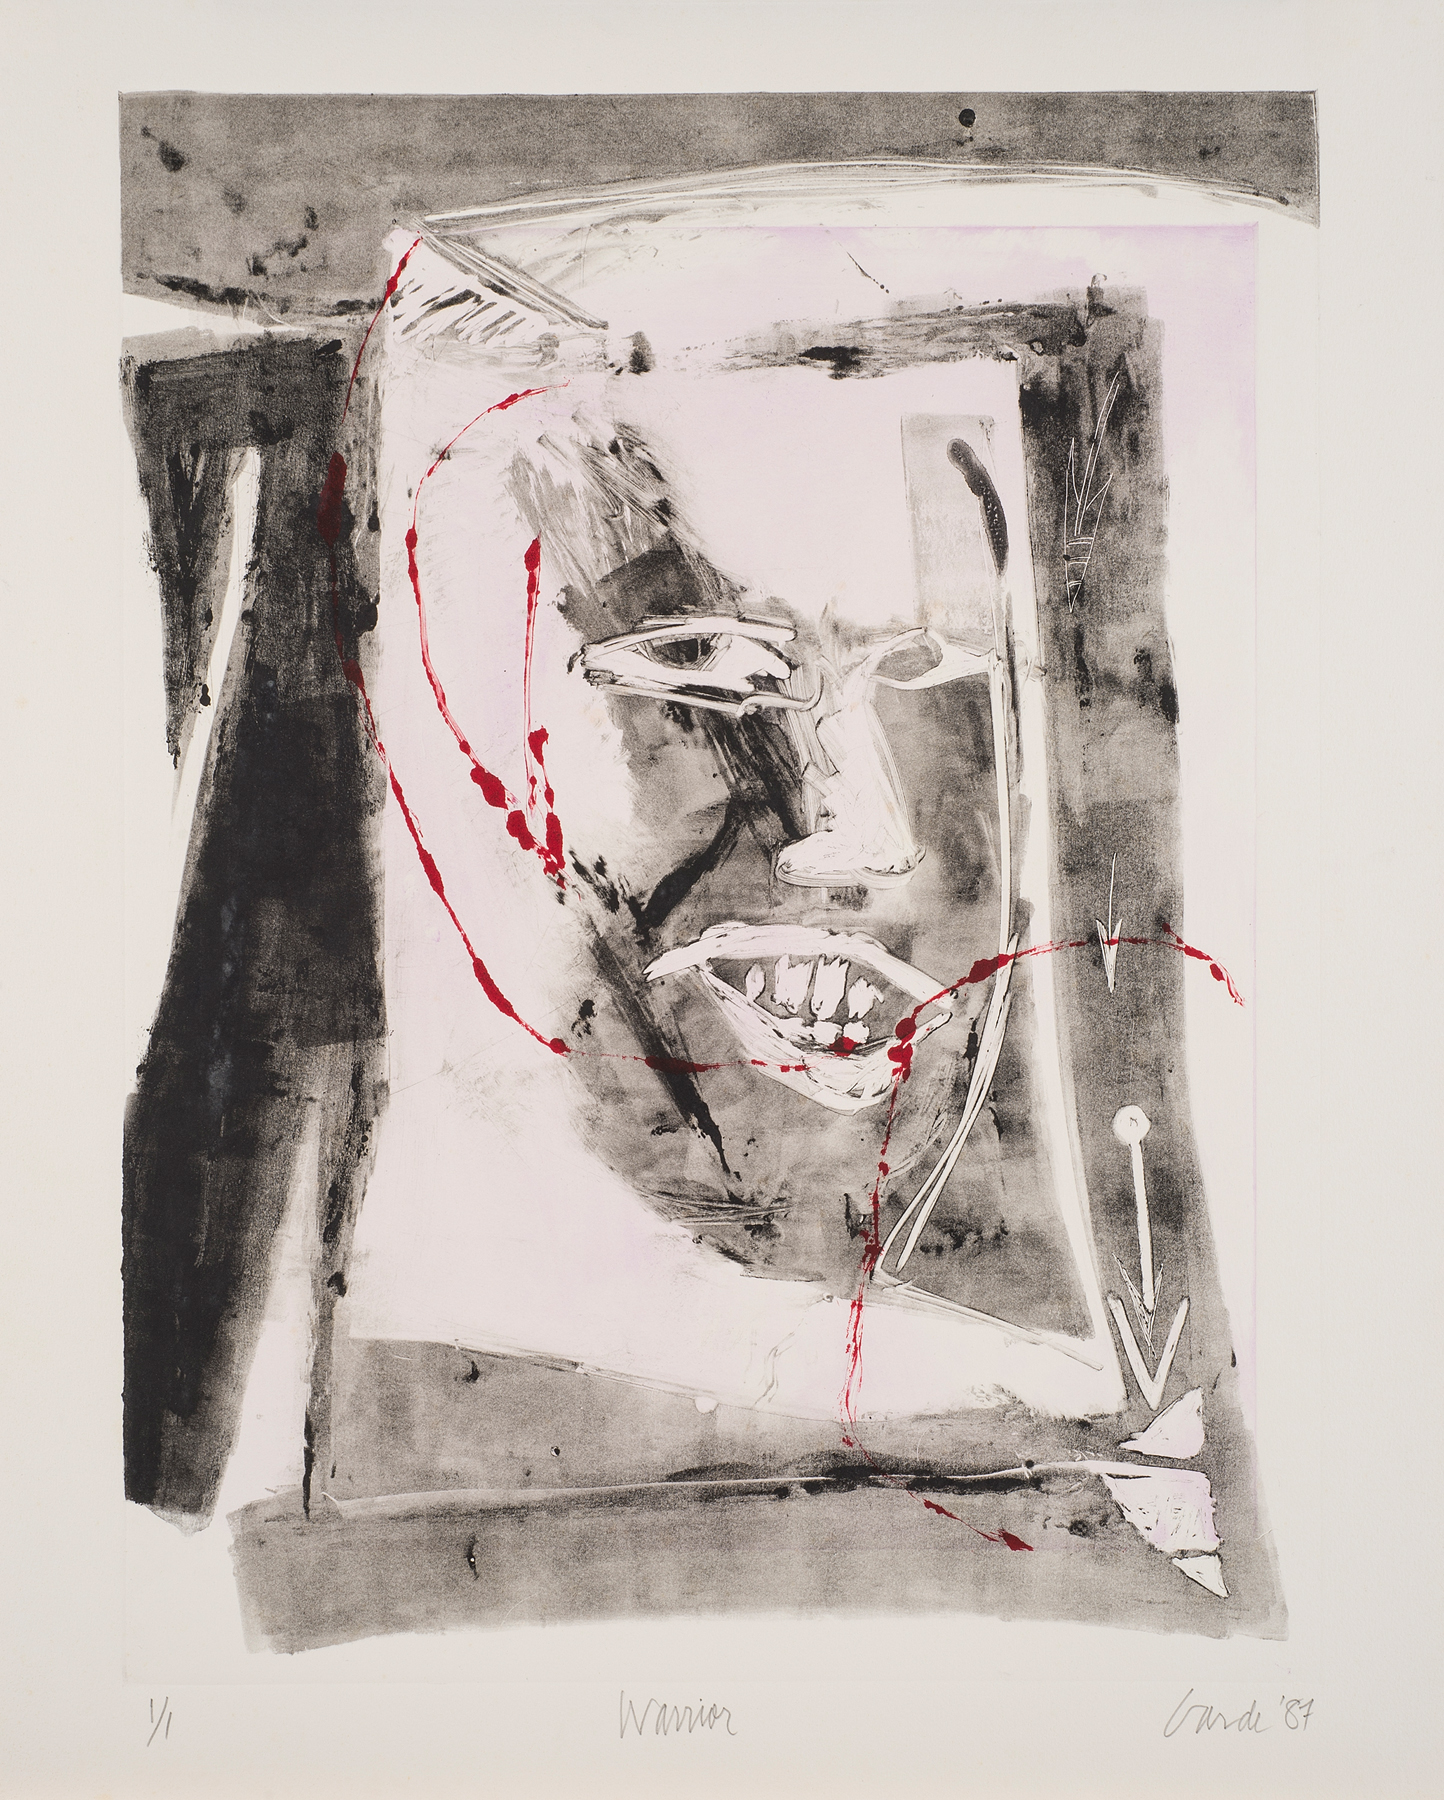 Warrior, 1987. Monotype on paper, 27 x 22 in. (68 x 56 cm.)